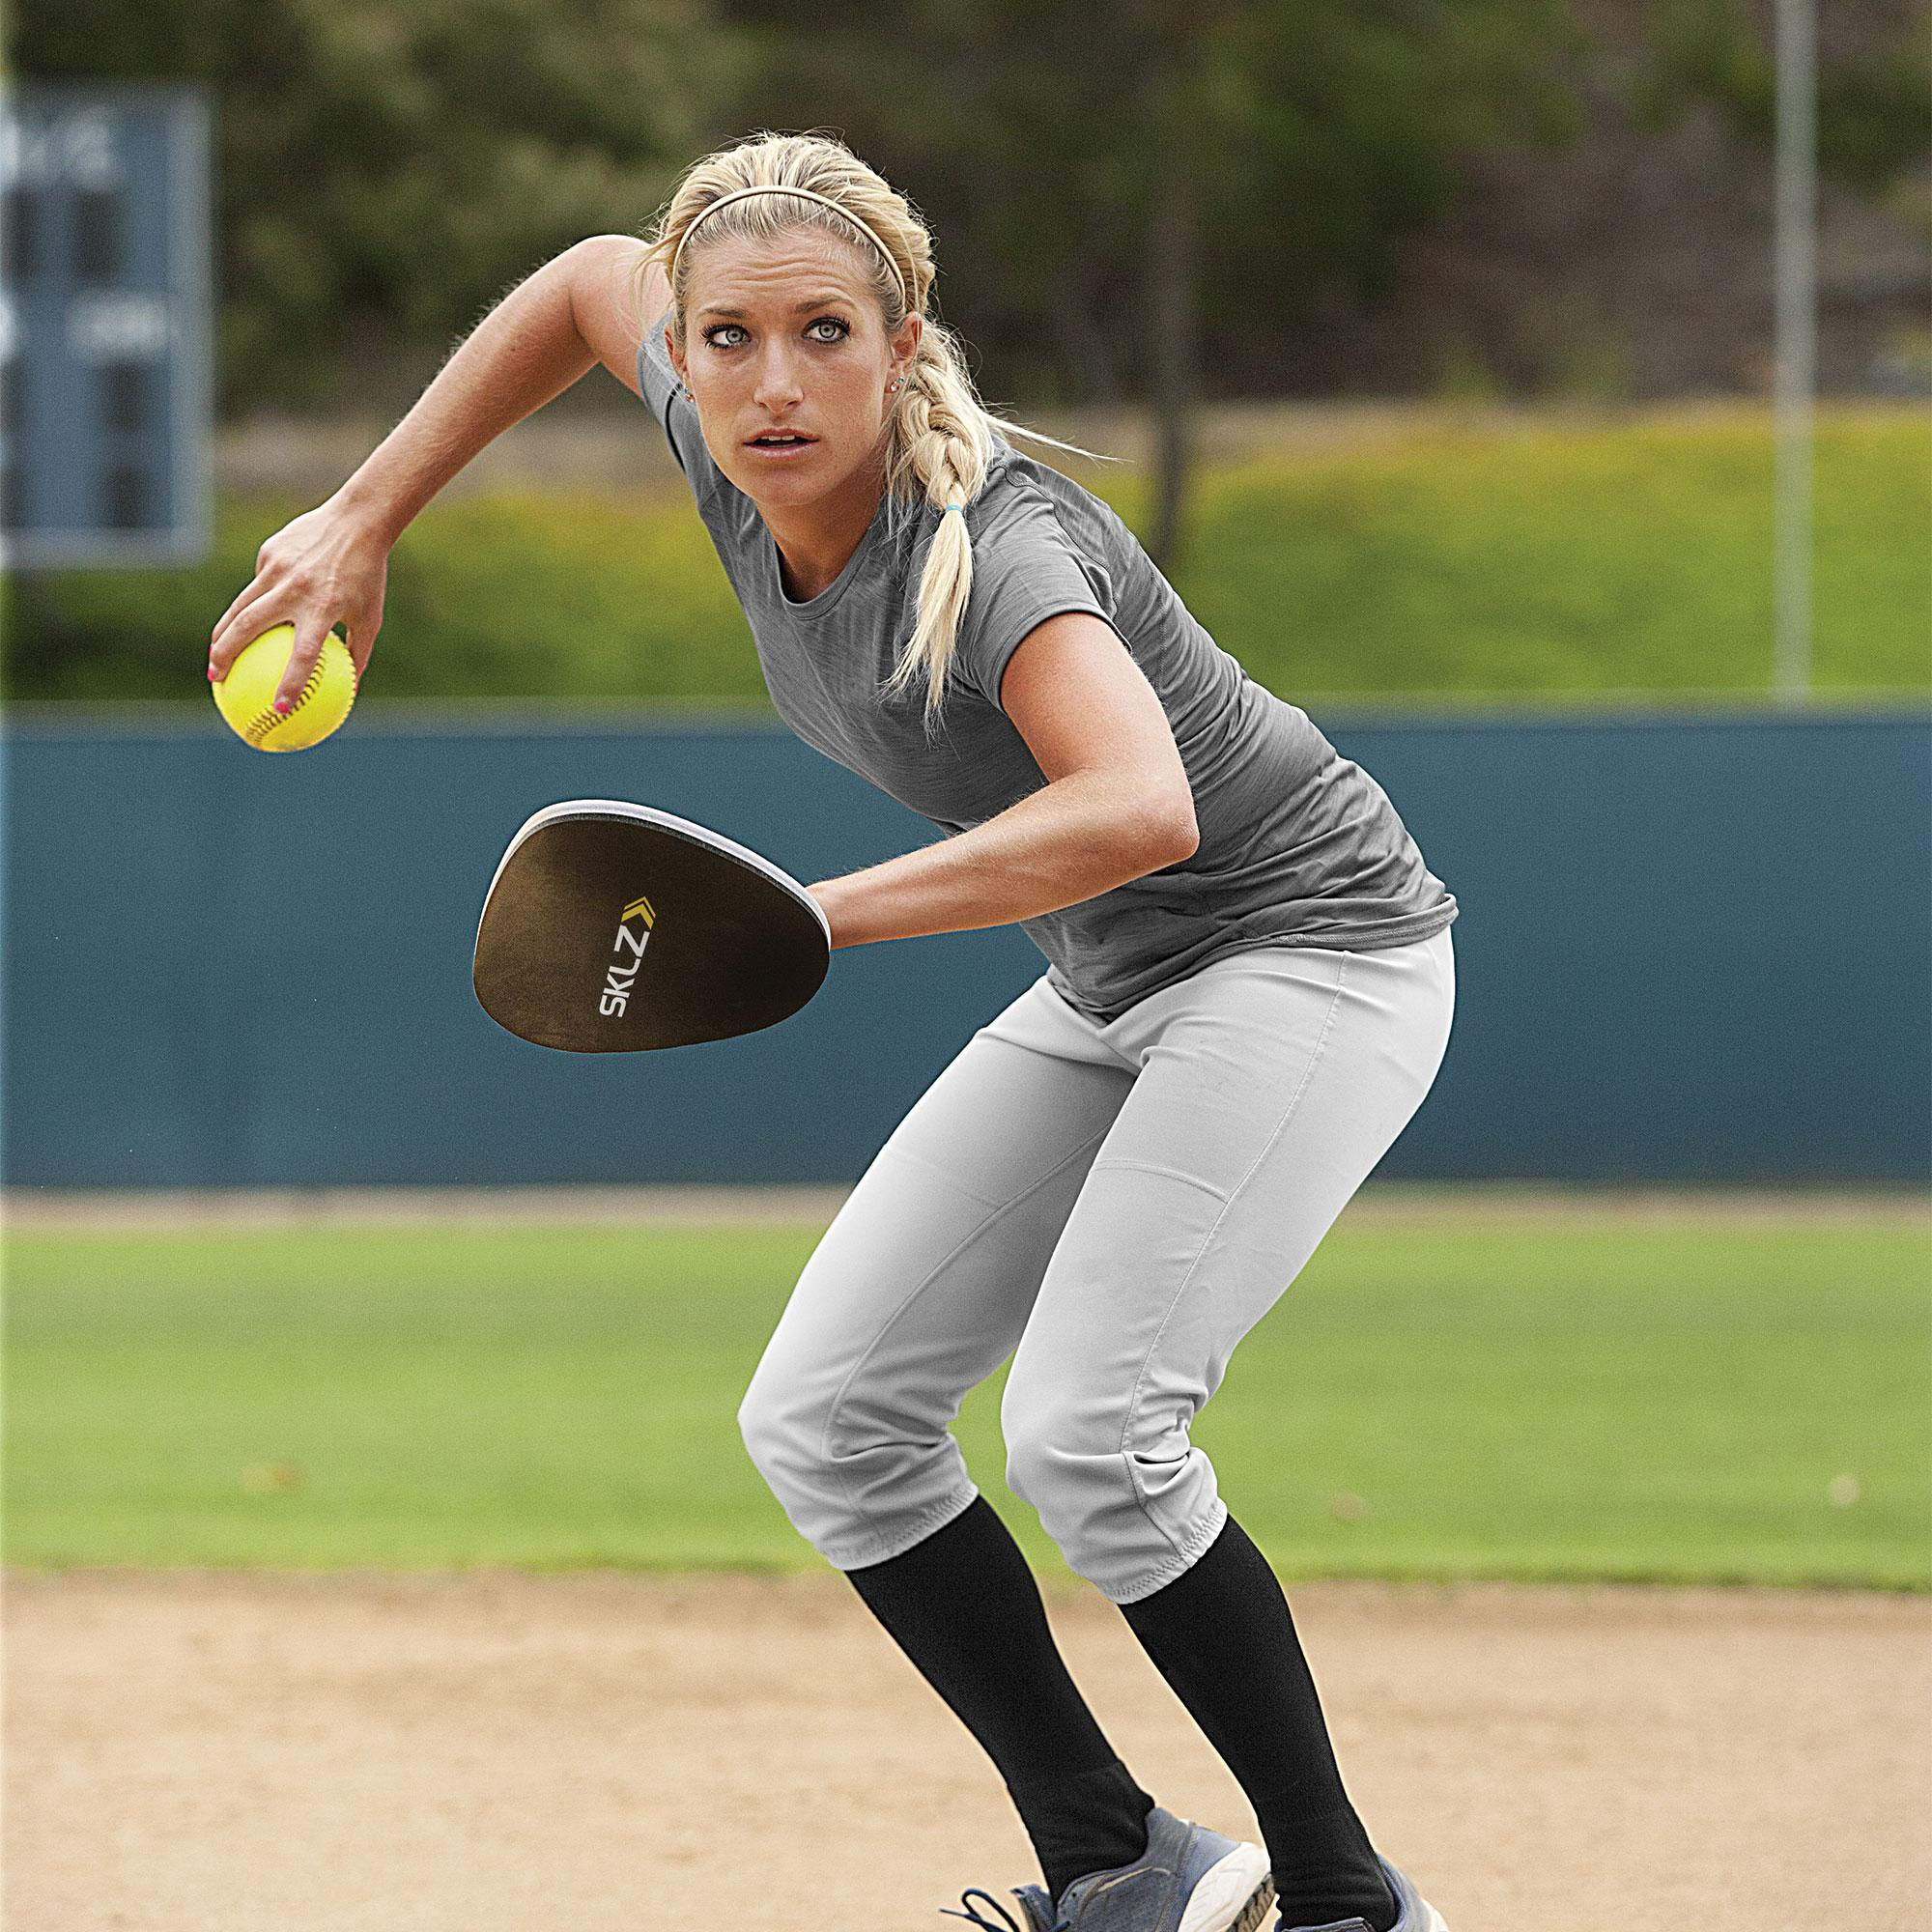 Amazon Com Sklz Softhands Baseball And Softball Fielding